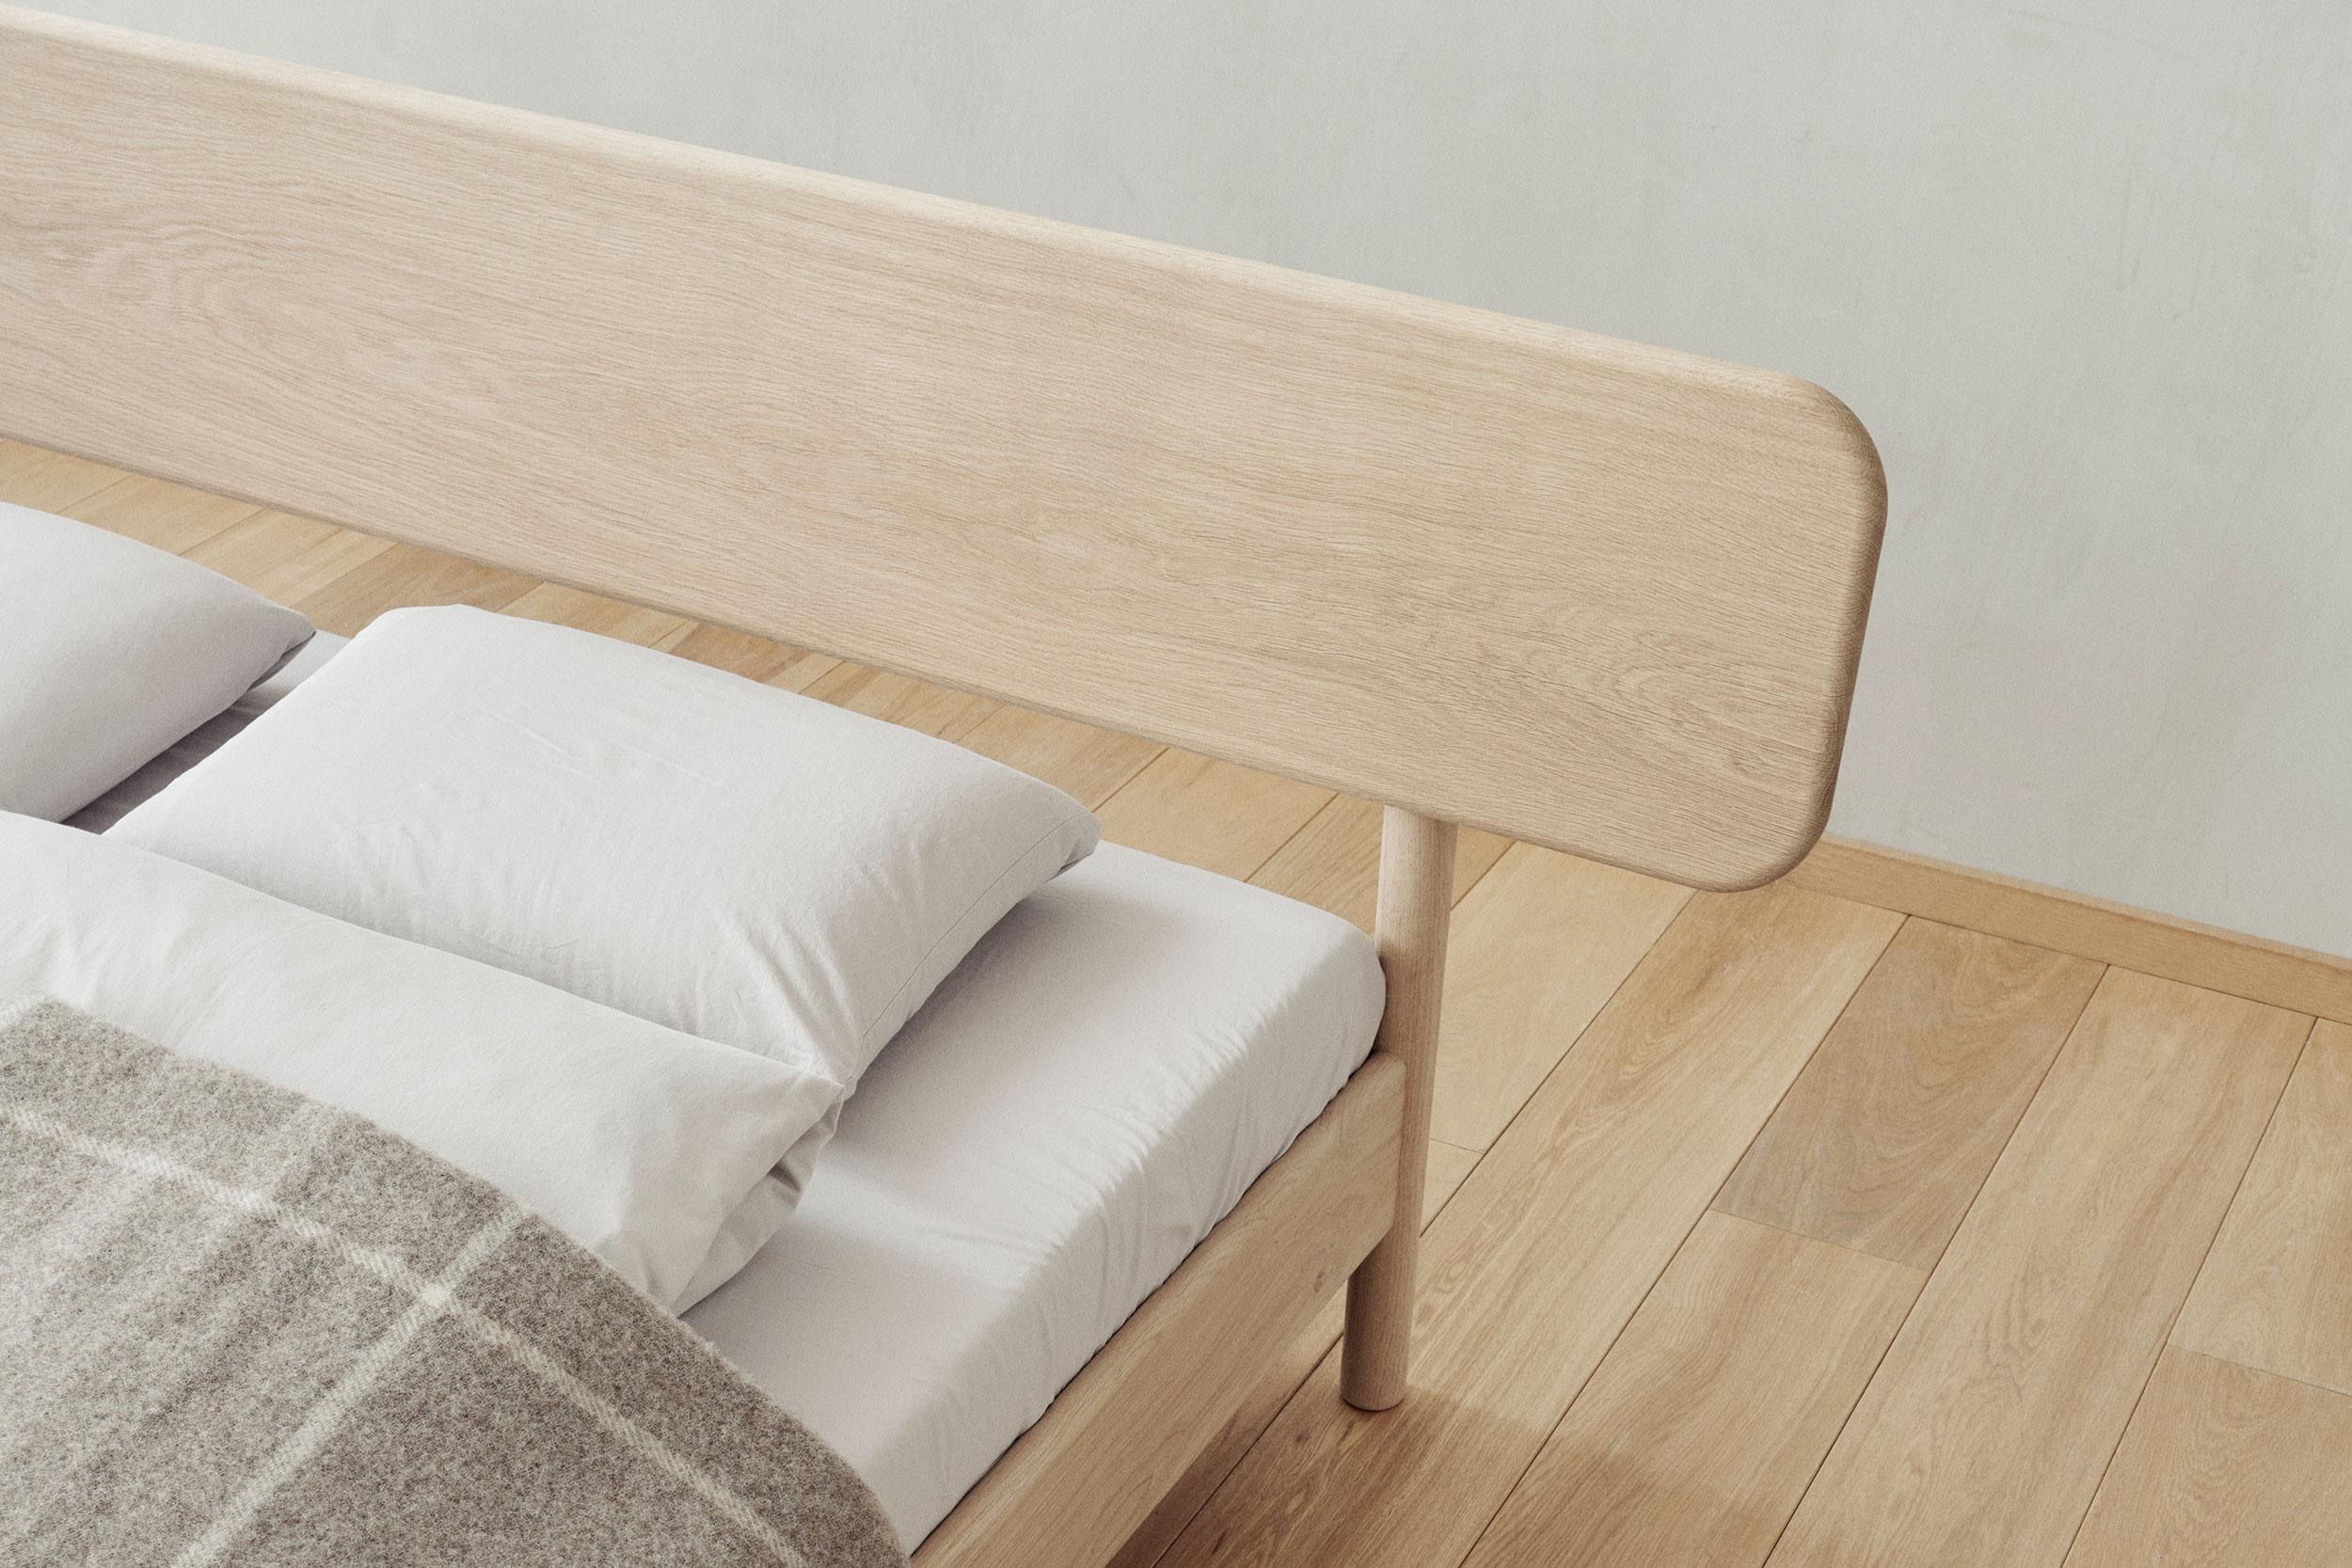 031-ALKEN-BED-AT-THE-LAB-RE-BEDS-DESIGN-BY-OLIVER-&-LUKAS-WEISSKROGH.jpg